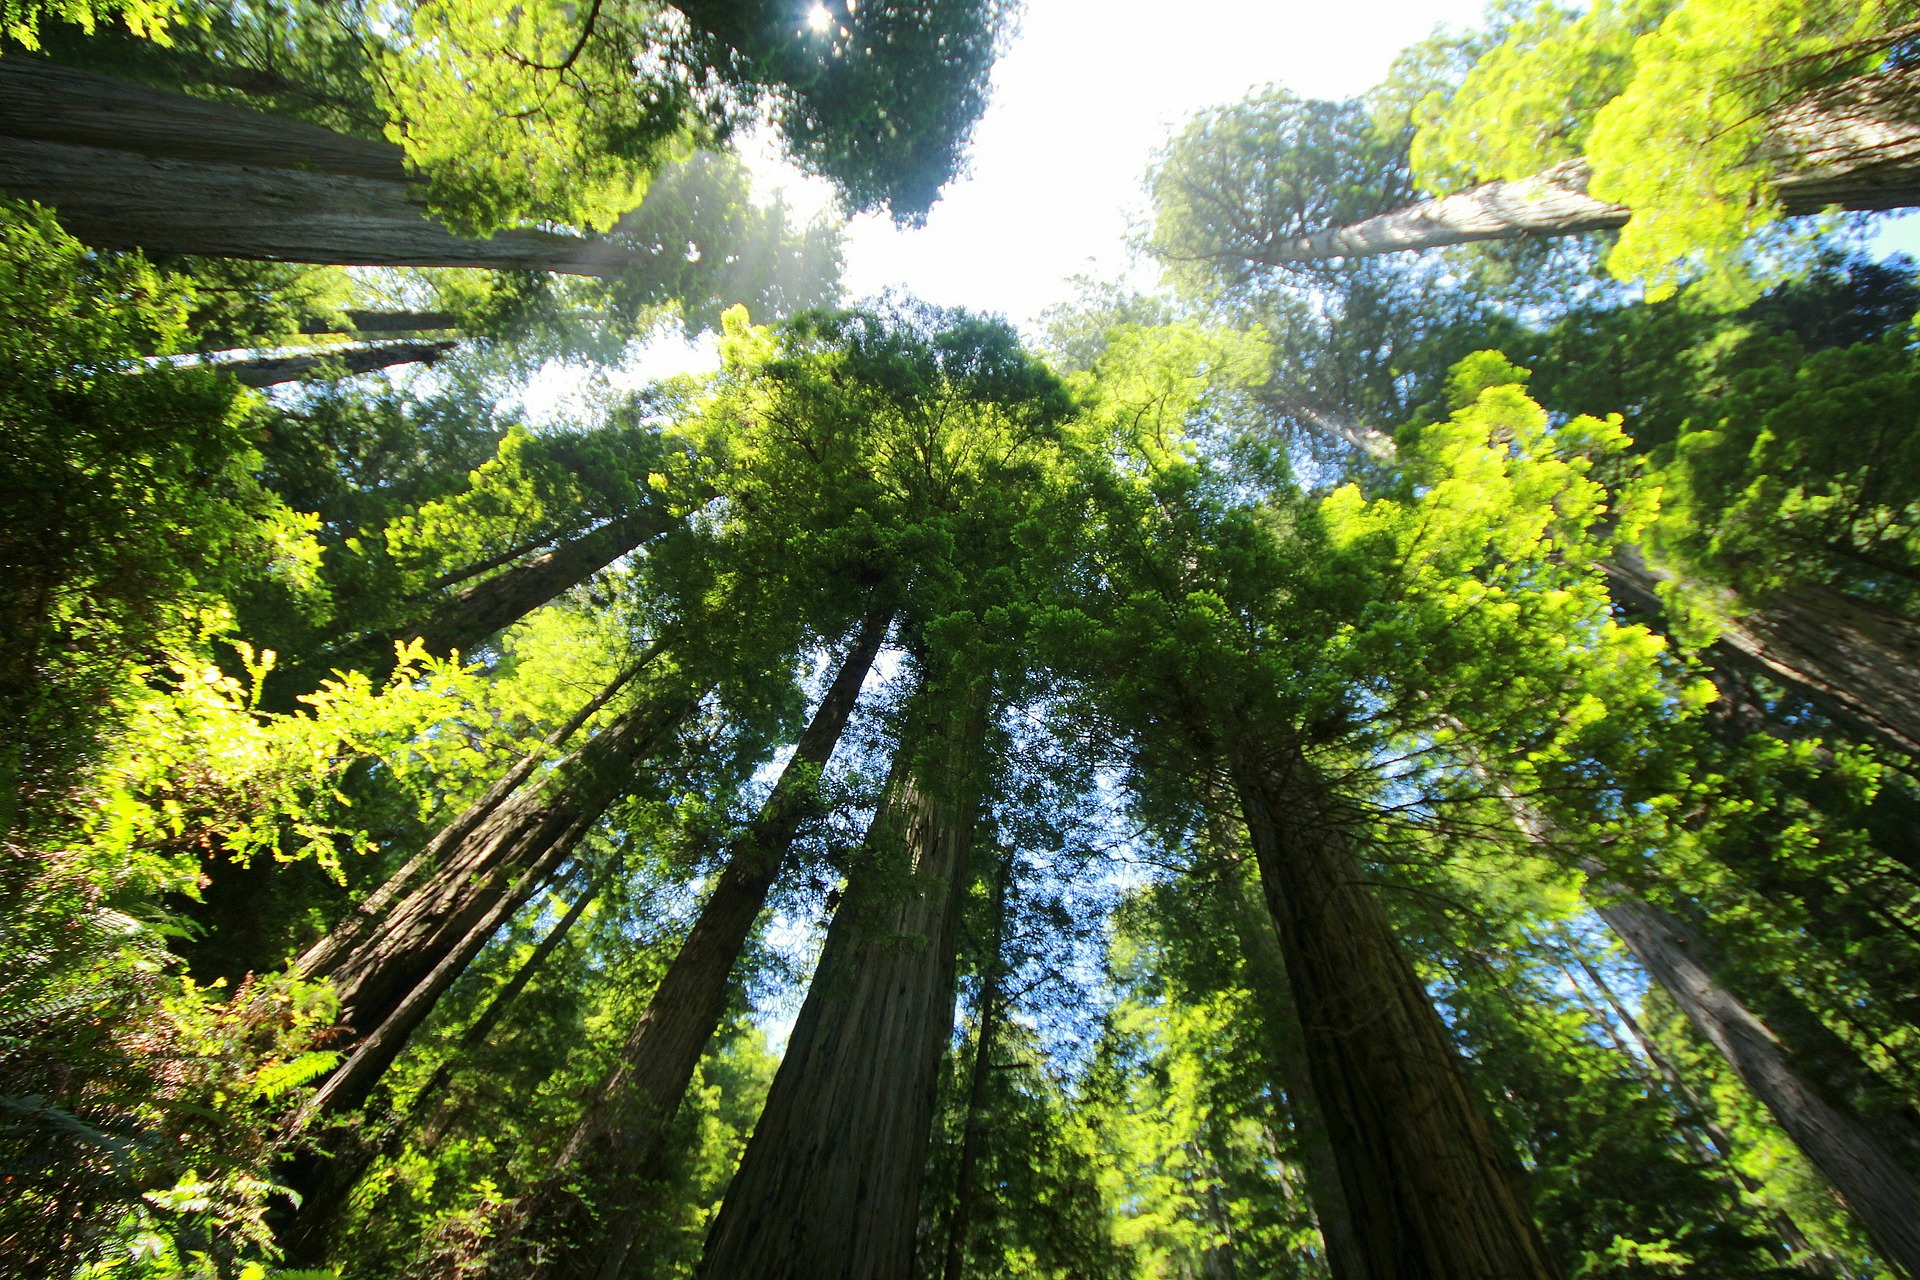 Giant Redwood Sequoia Trees, Muir Woods, Marin County, California